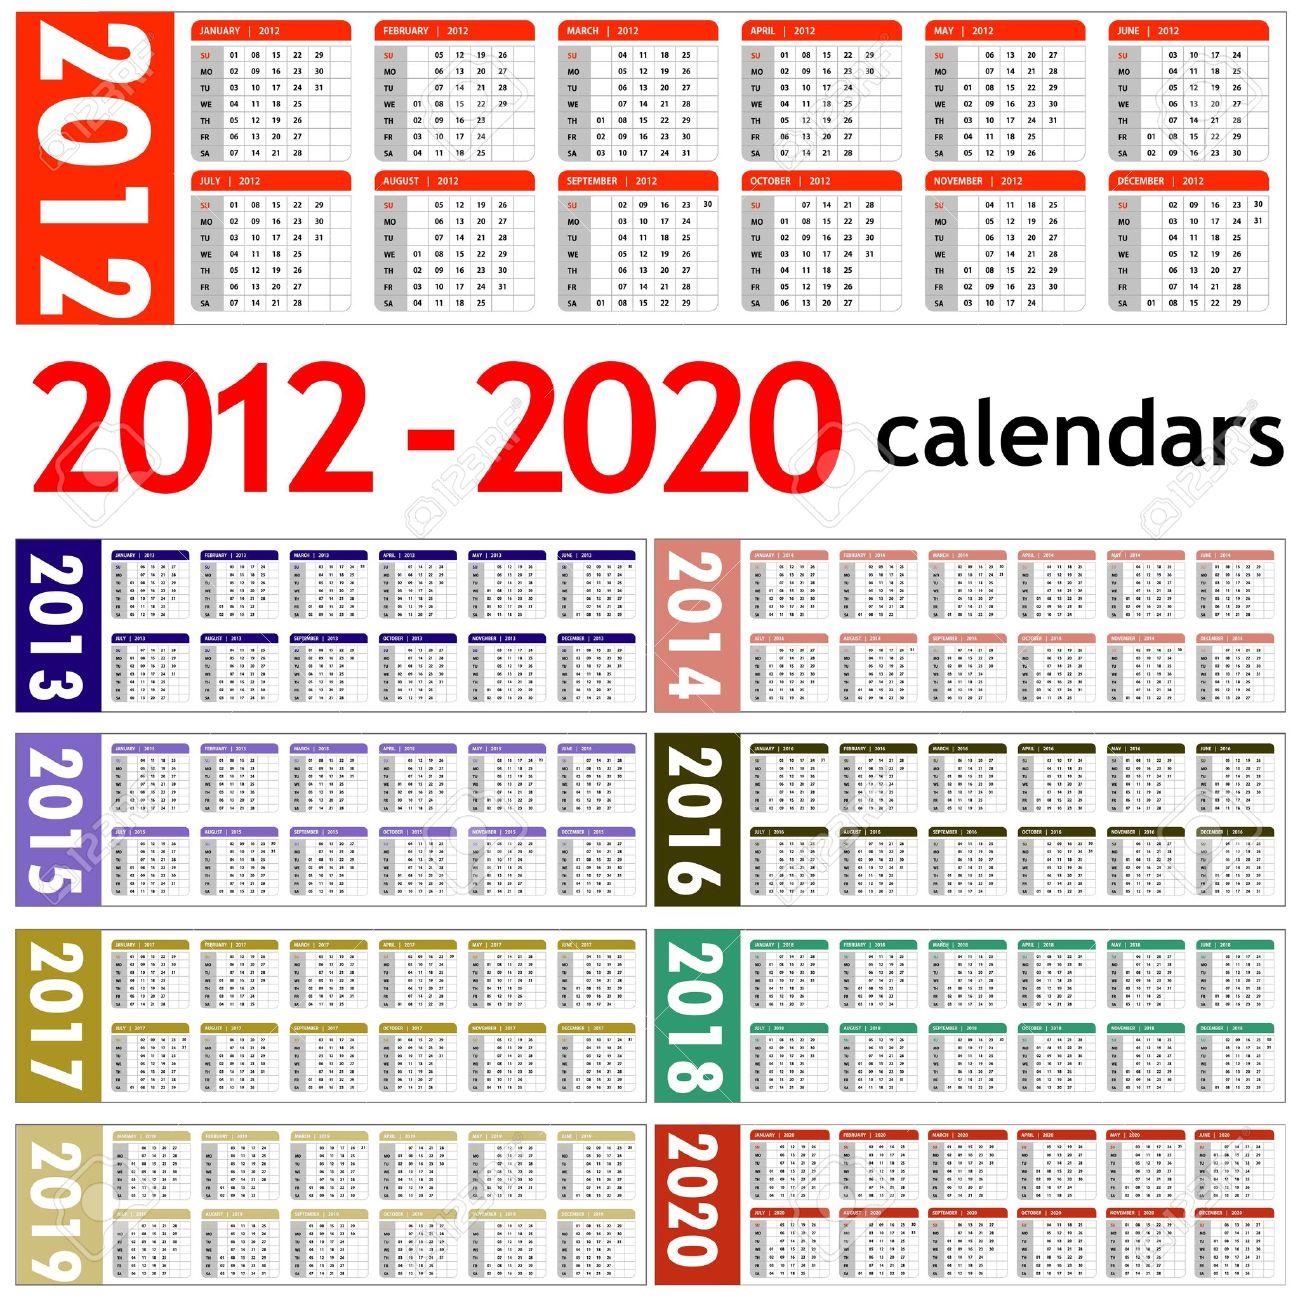 Календарь для намаза 2017-2018 год